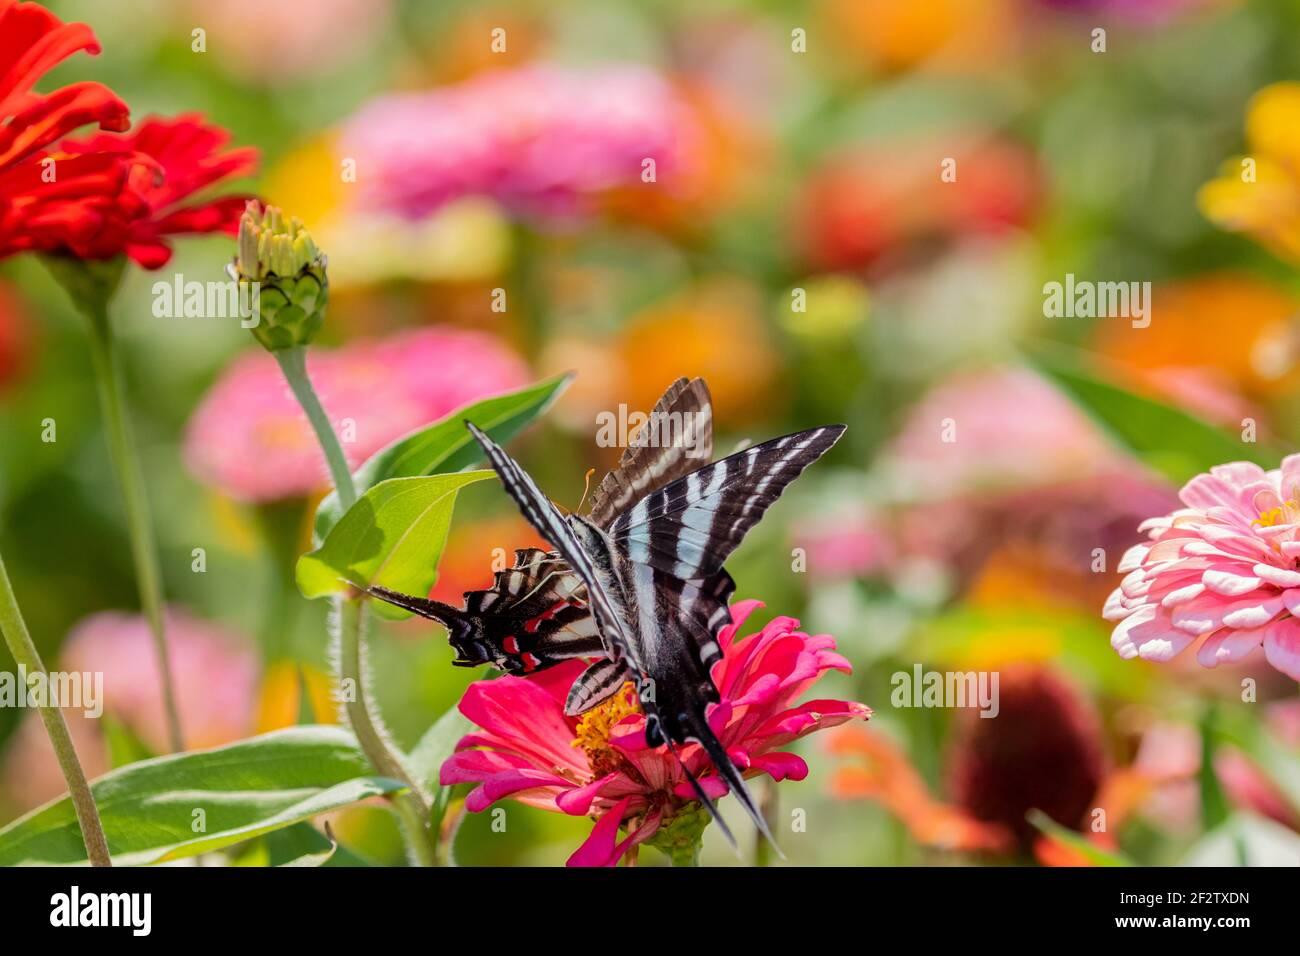 03006-00506 Zebra Swallowtails (Protographium marcellus) on Zinnia Union Co. IL Stock Photo